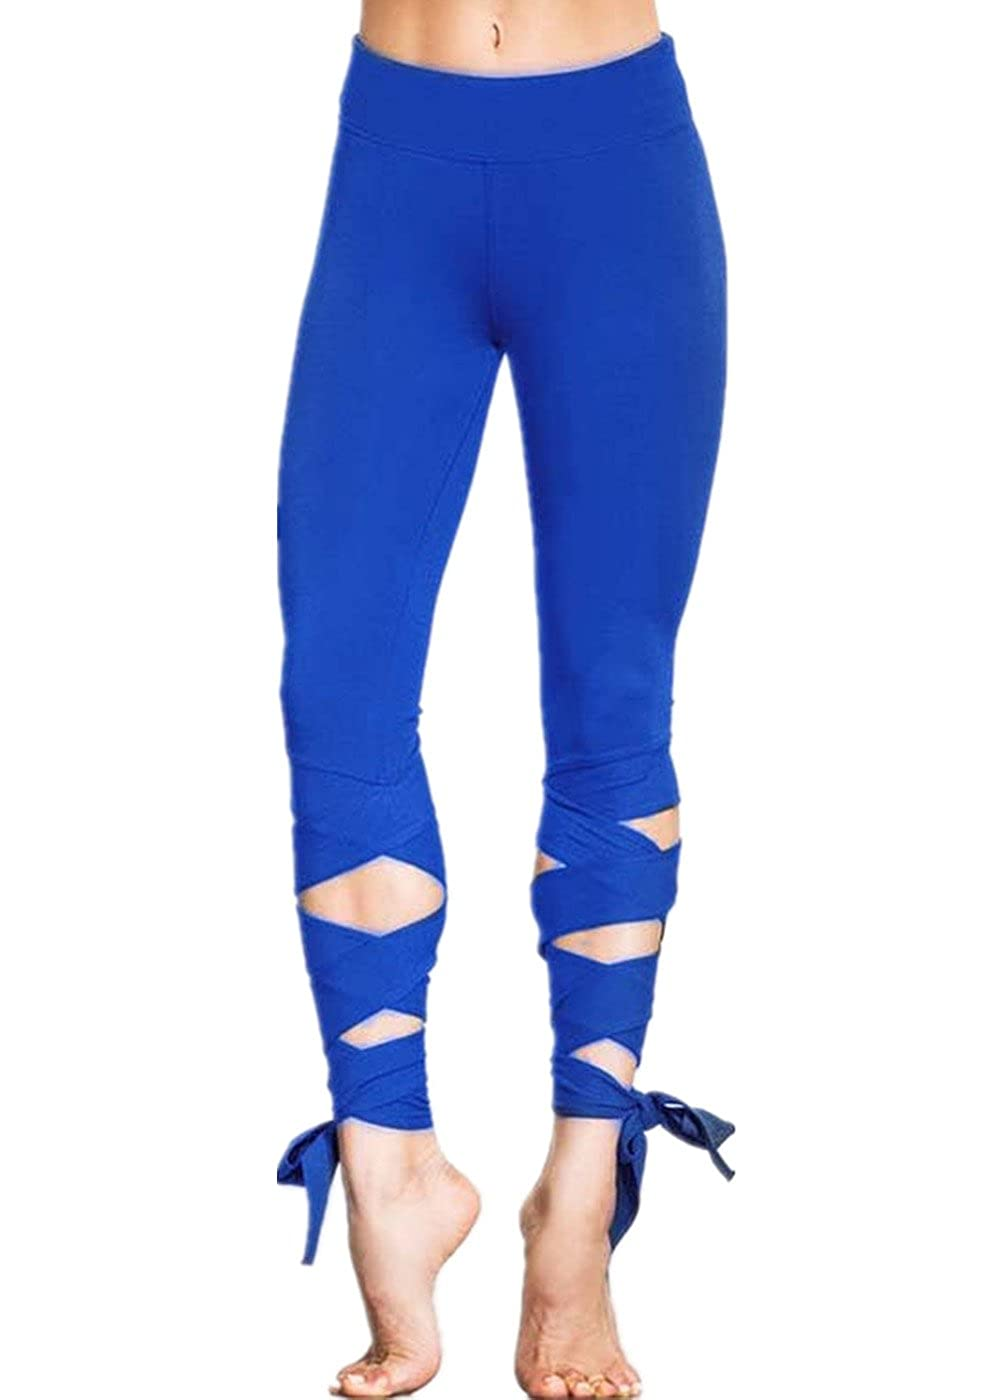 Cresay Women's Cutout Tie Cuff Leggings Slim Workout Gym Yoga Ballet Pants